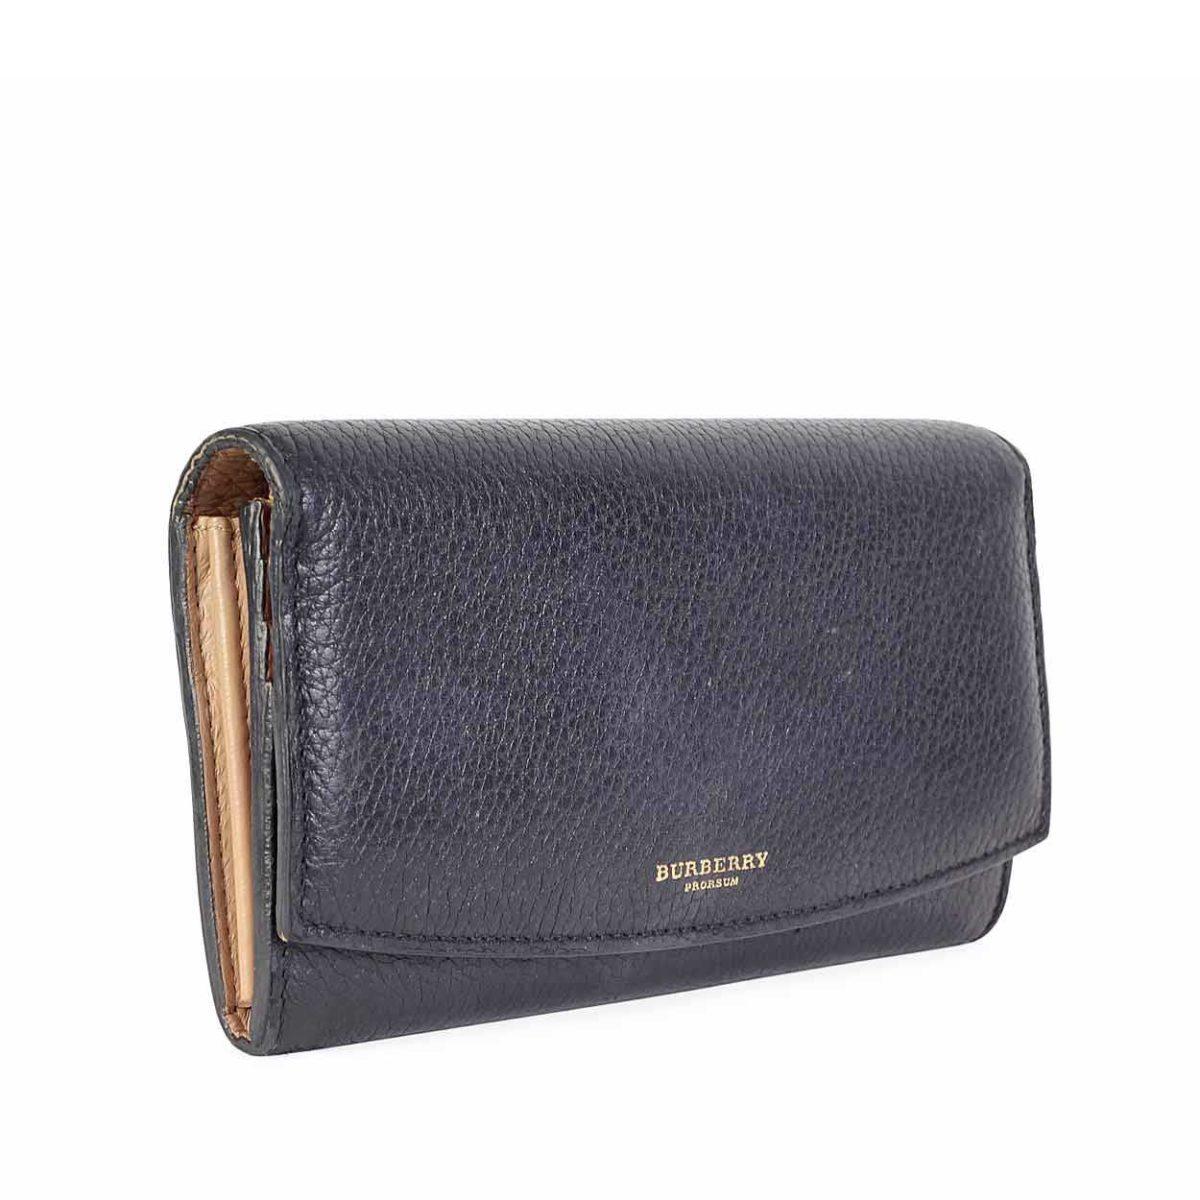 c1d7c1d0045a BURBERRY London Continental Wallet Black | Luxity